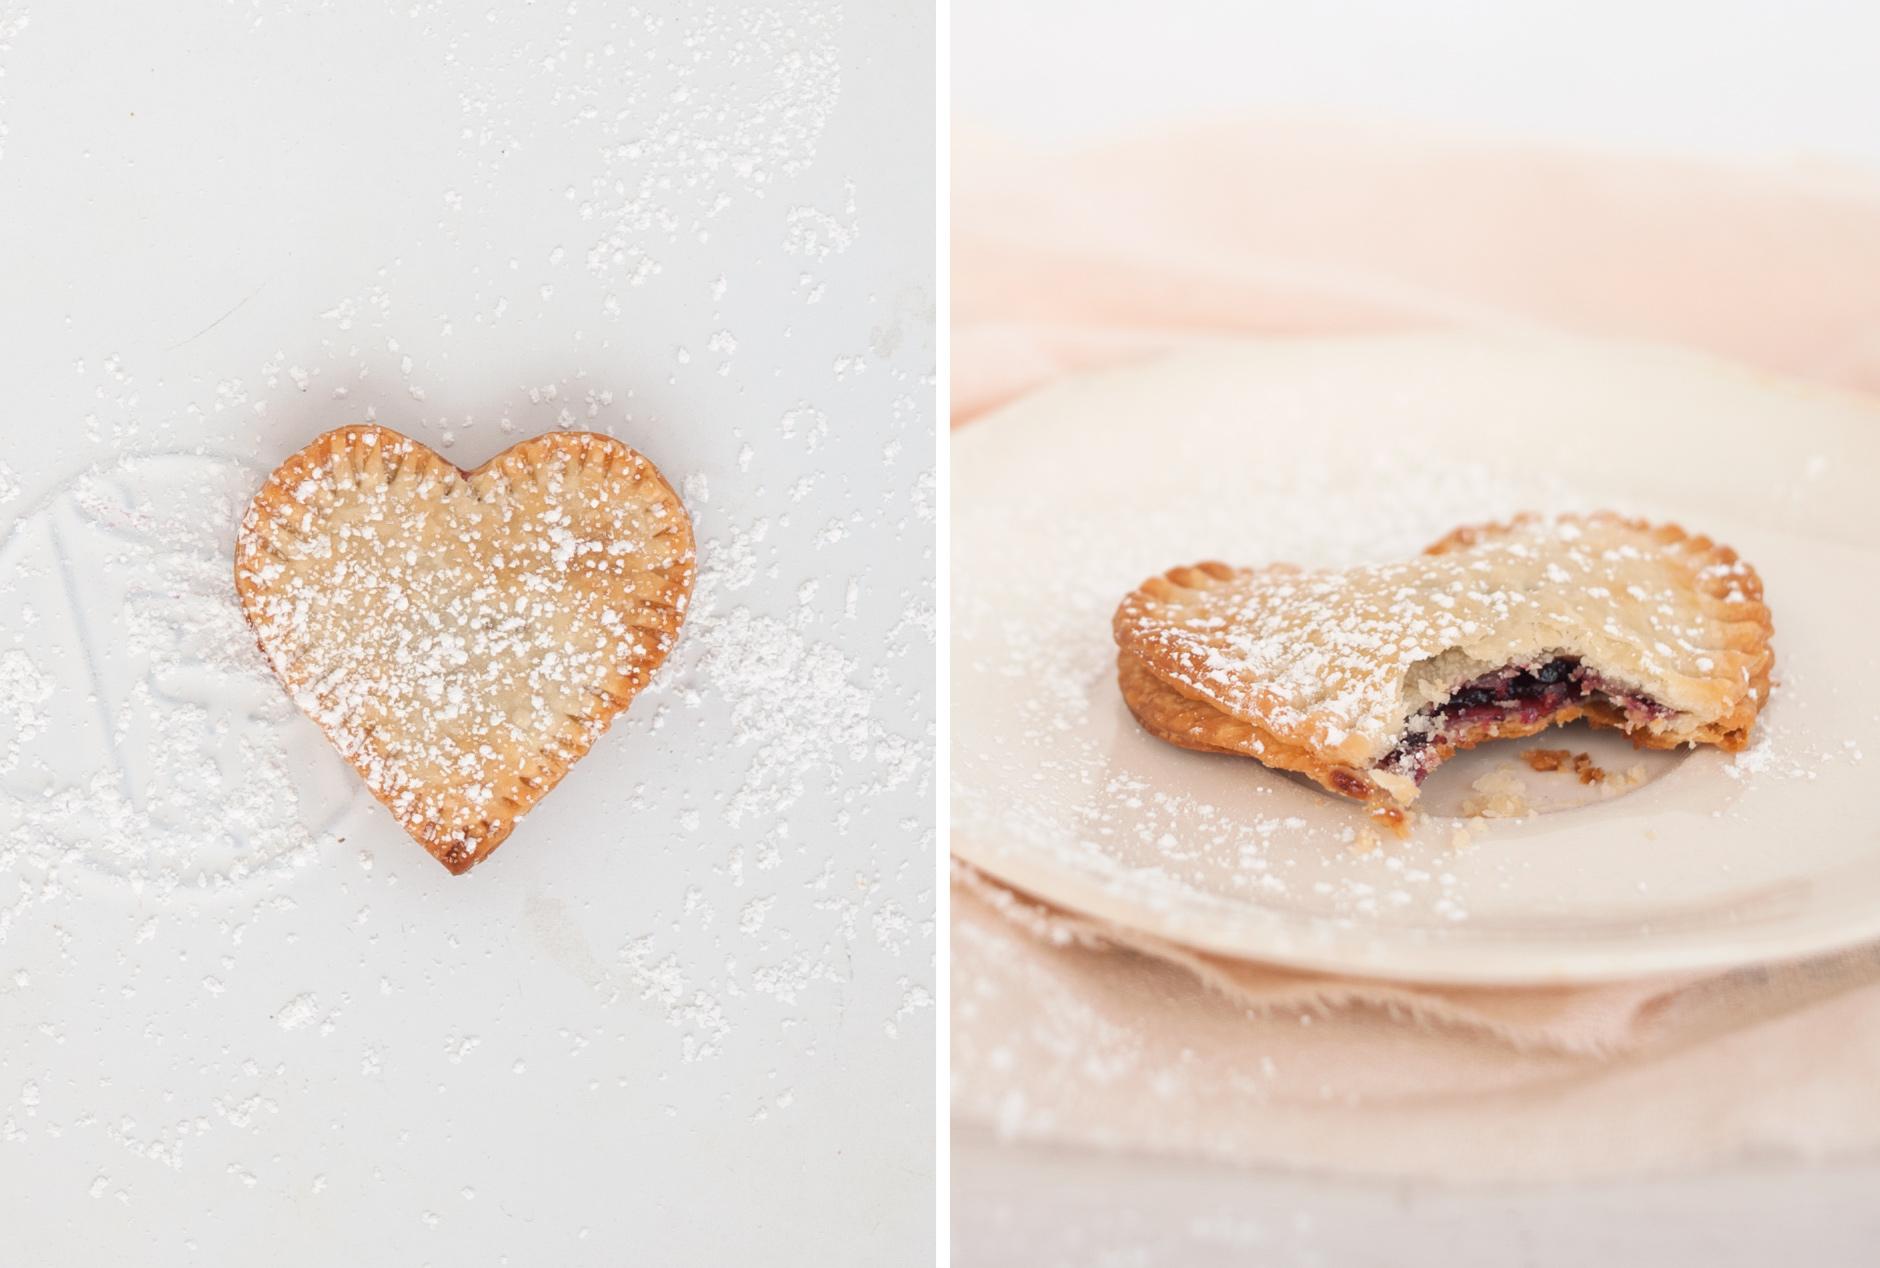 heart_pies_food_photography_5.jpg